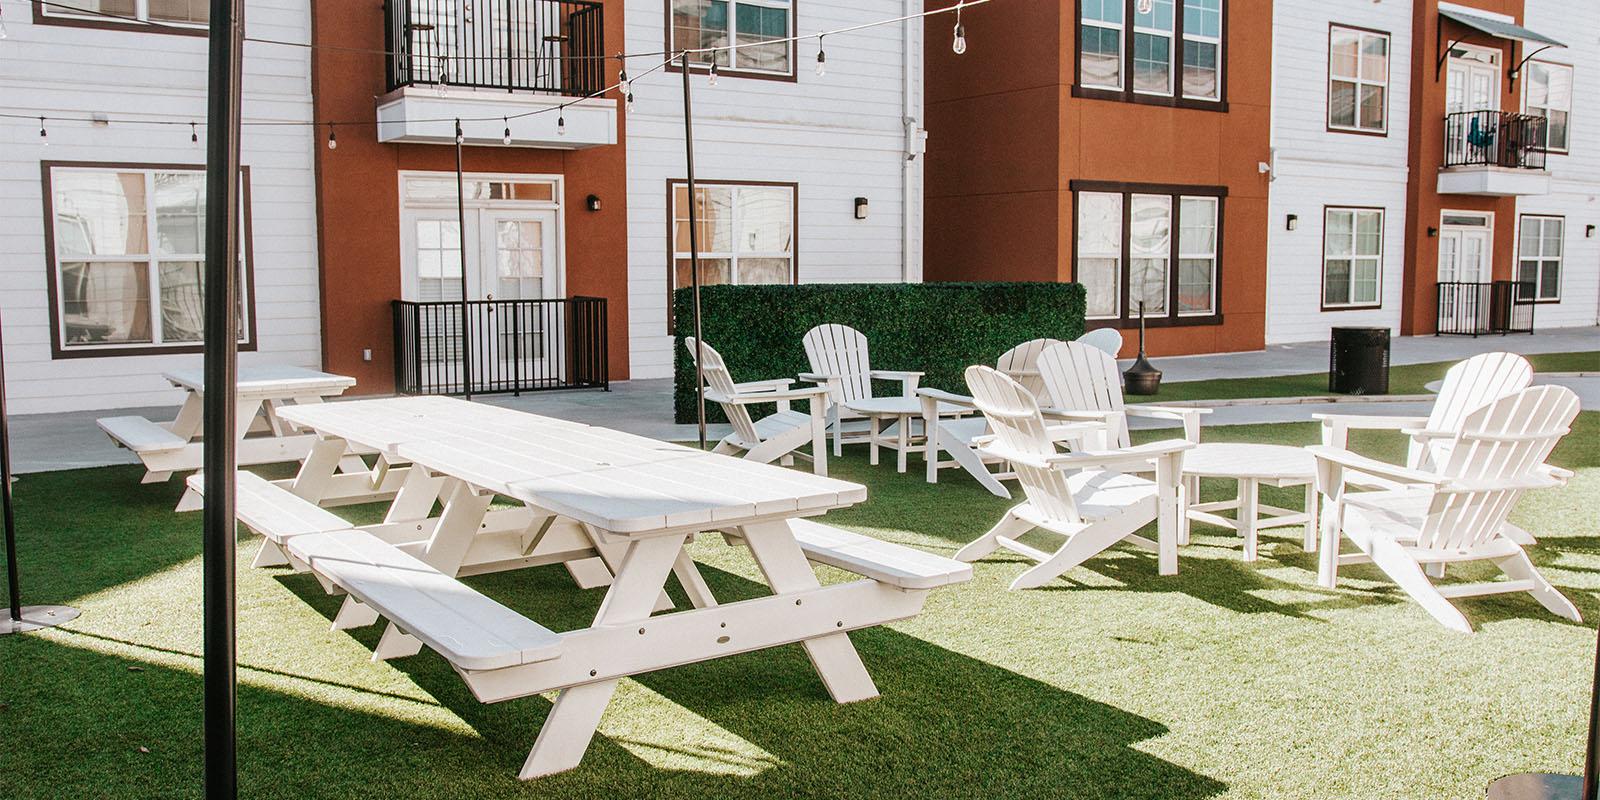 Courtyard & Outdoor <br/>Amenity Areas gallery image 1